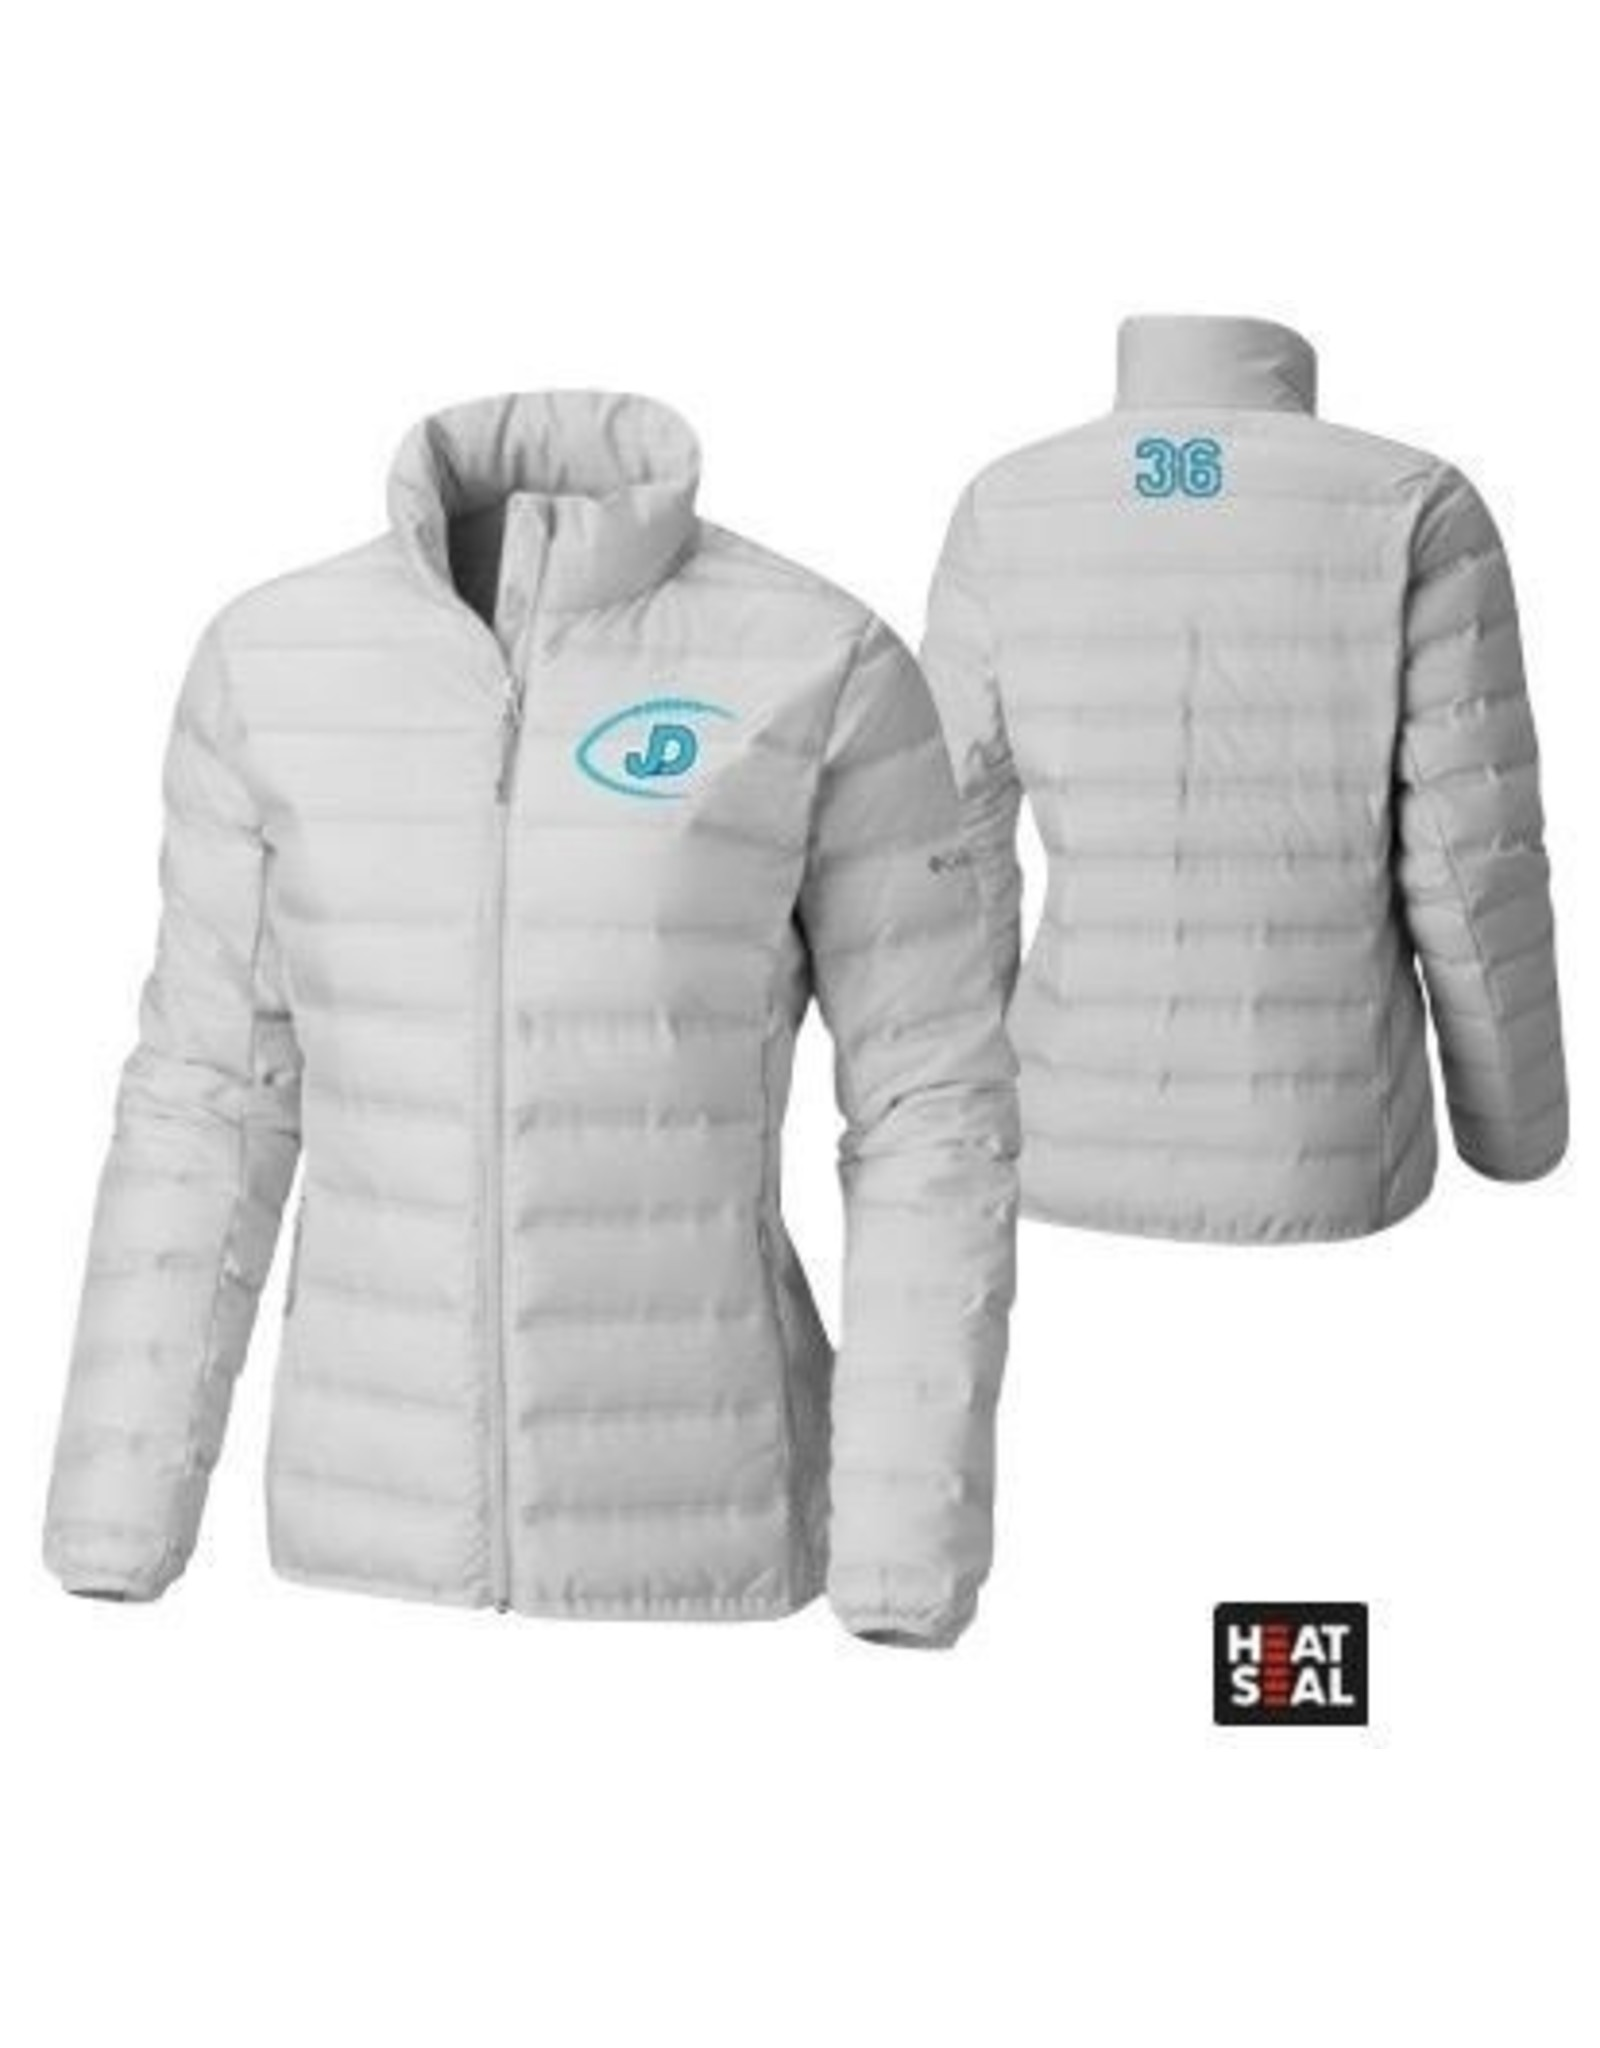 NON-UNIFORM Women's Columbia embroidered JD Football Jacket